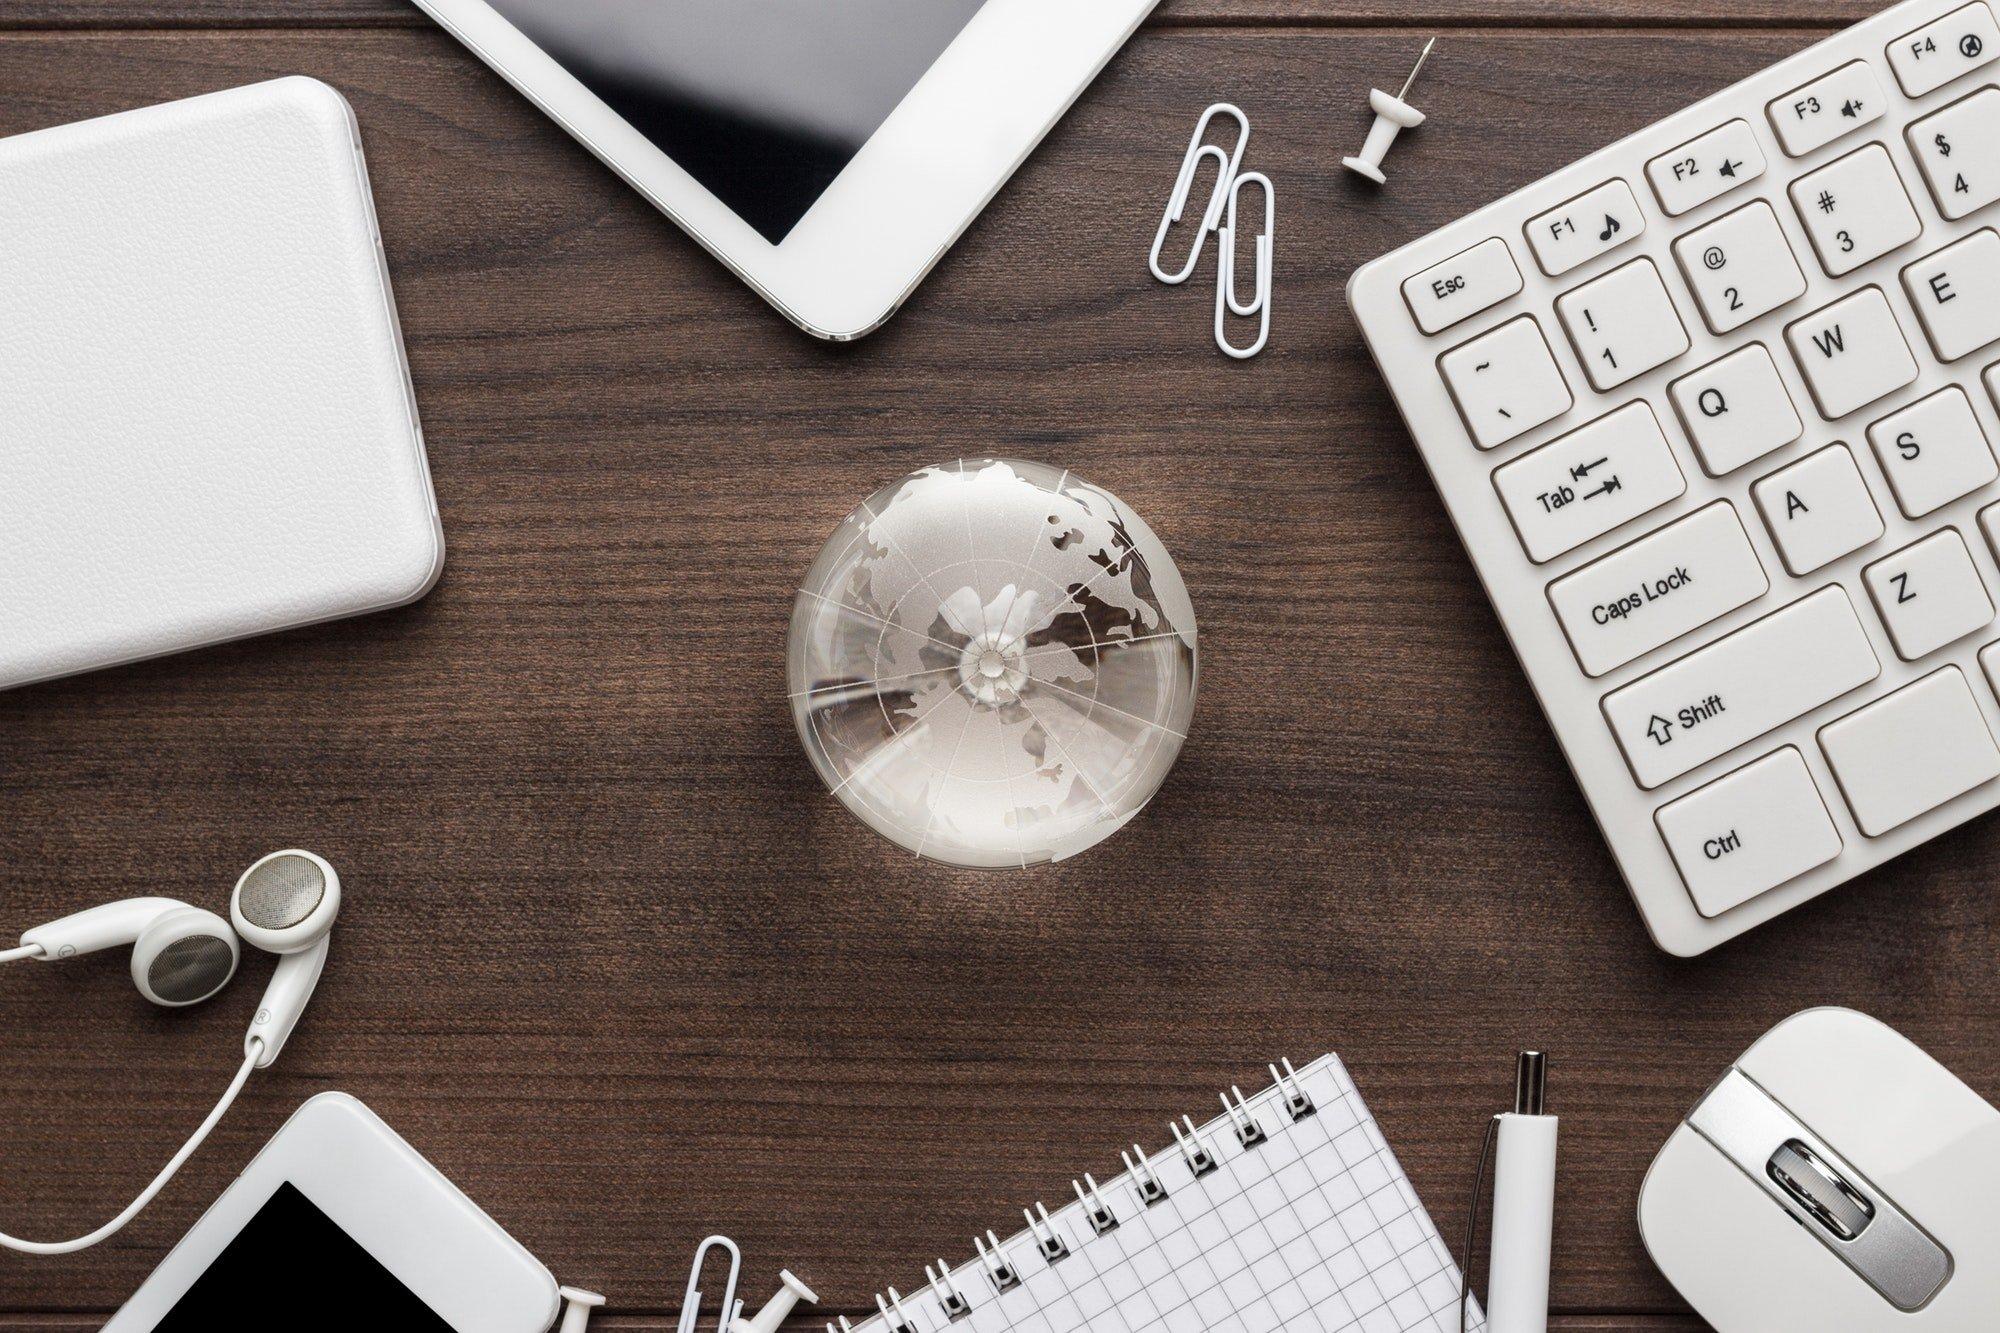 Working Online Concept